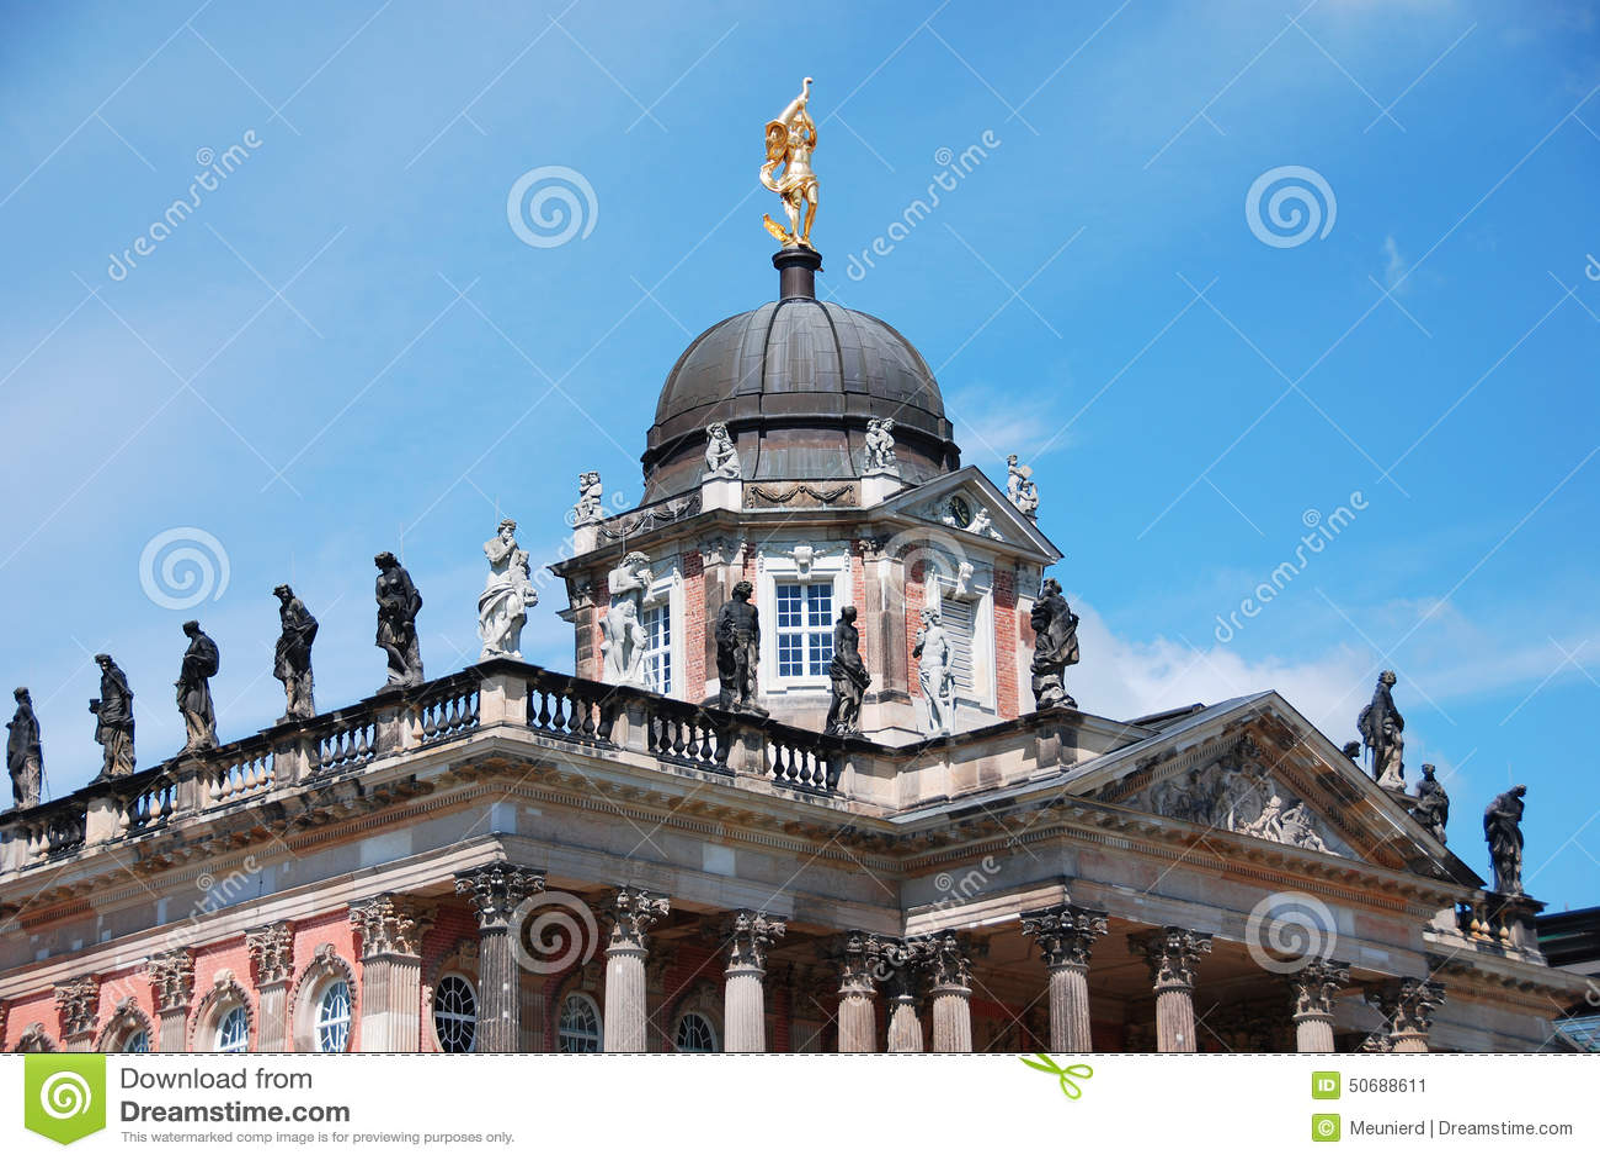 Download 宫殿在Sanssouci公园 库存图片. 图片 包括有 观光, 皇家, 公园, 风景, 遗产, 巨大, bulblet - 50688611